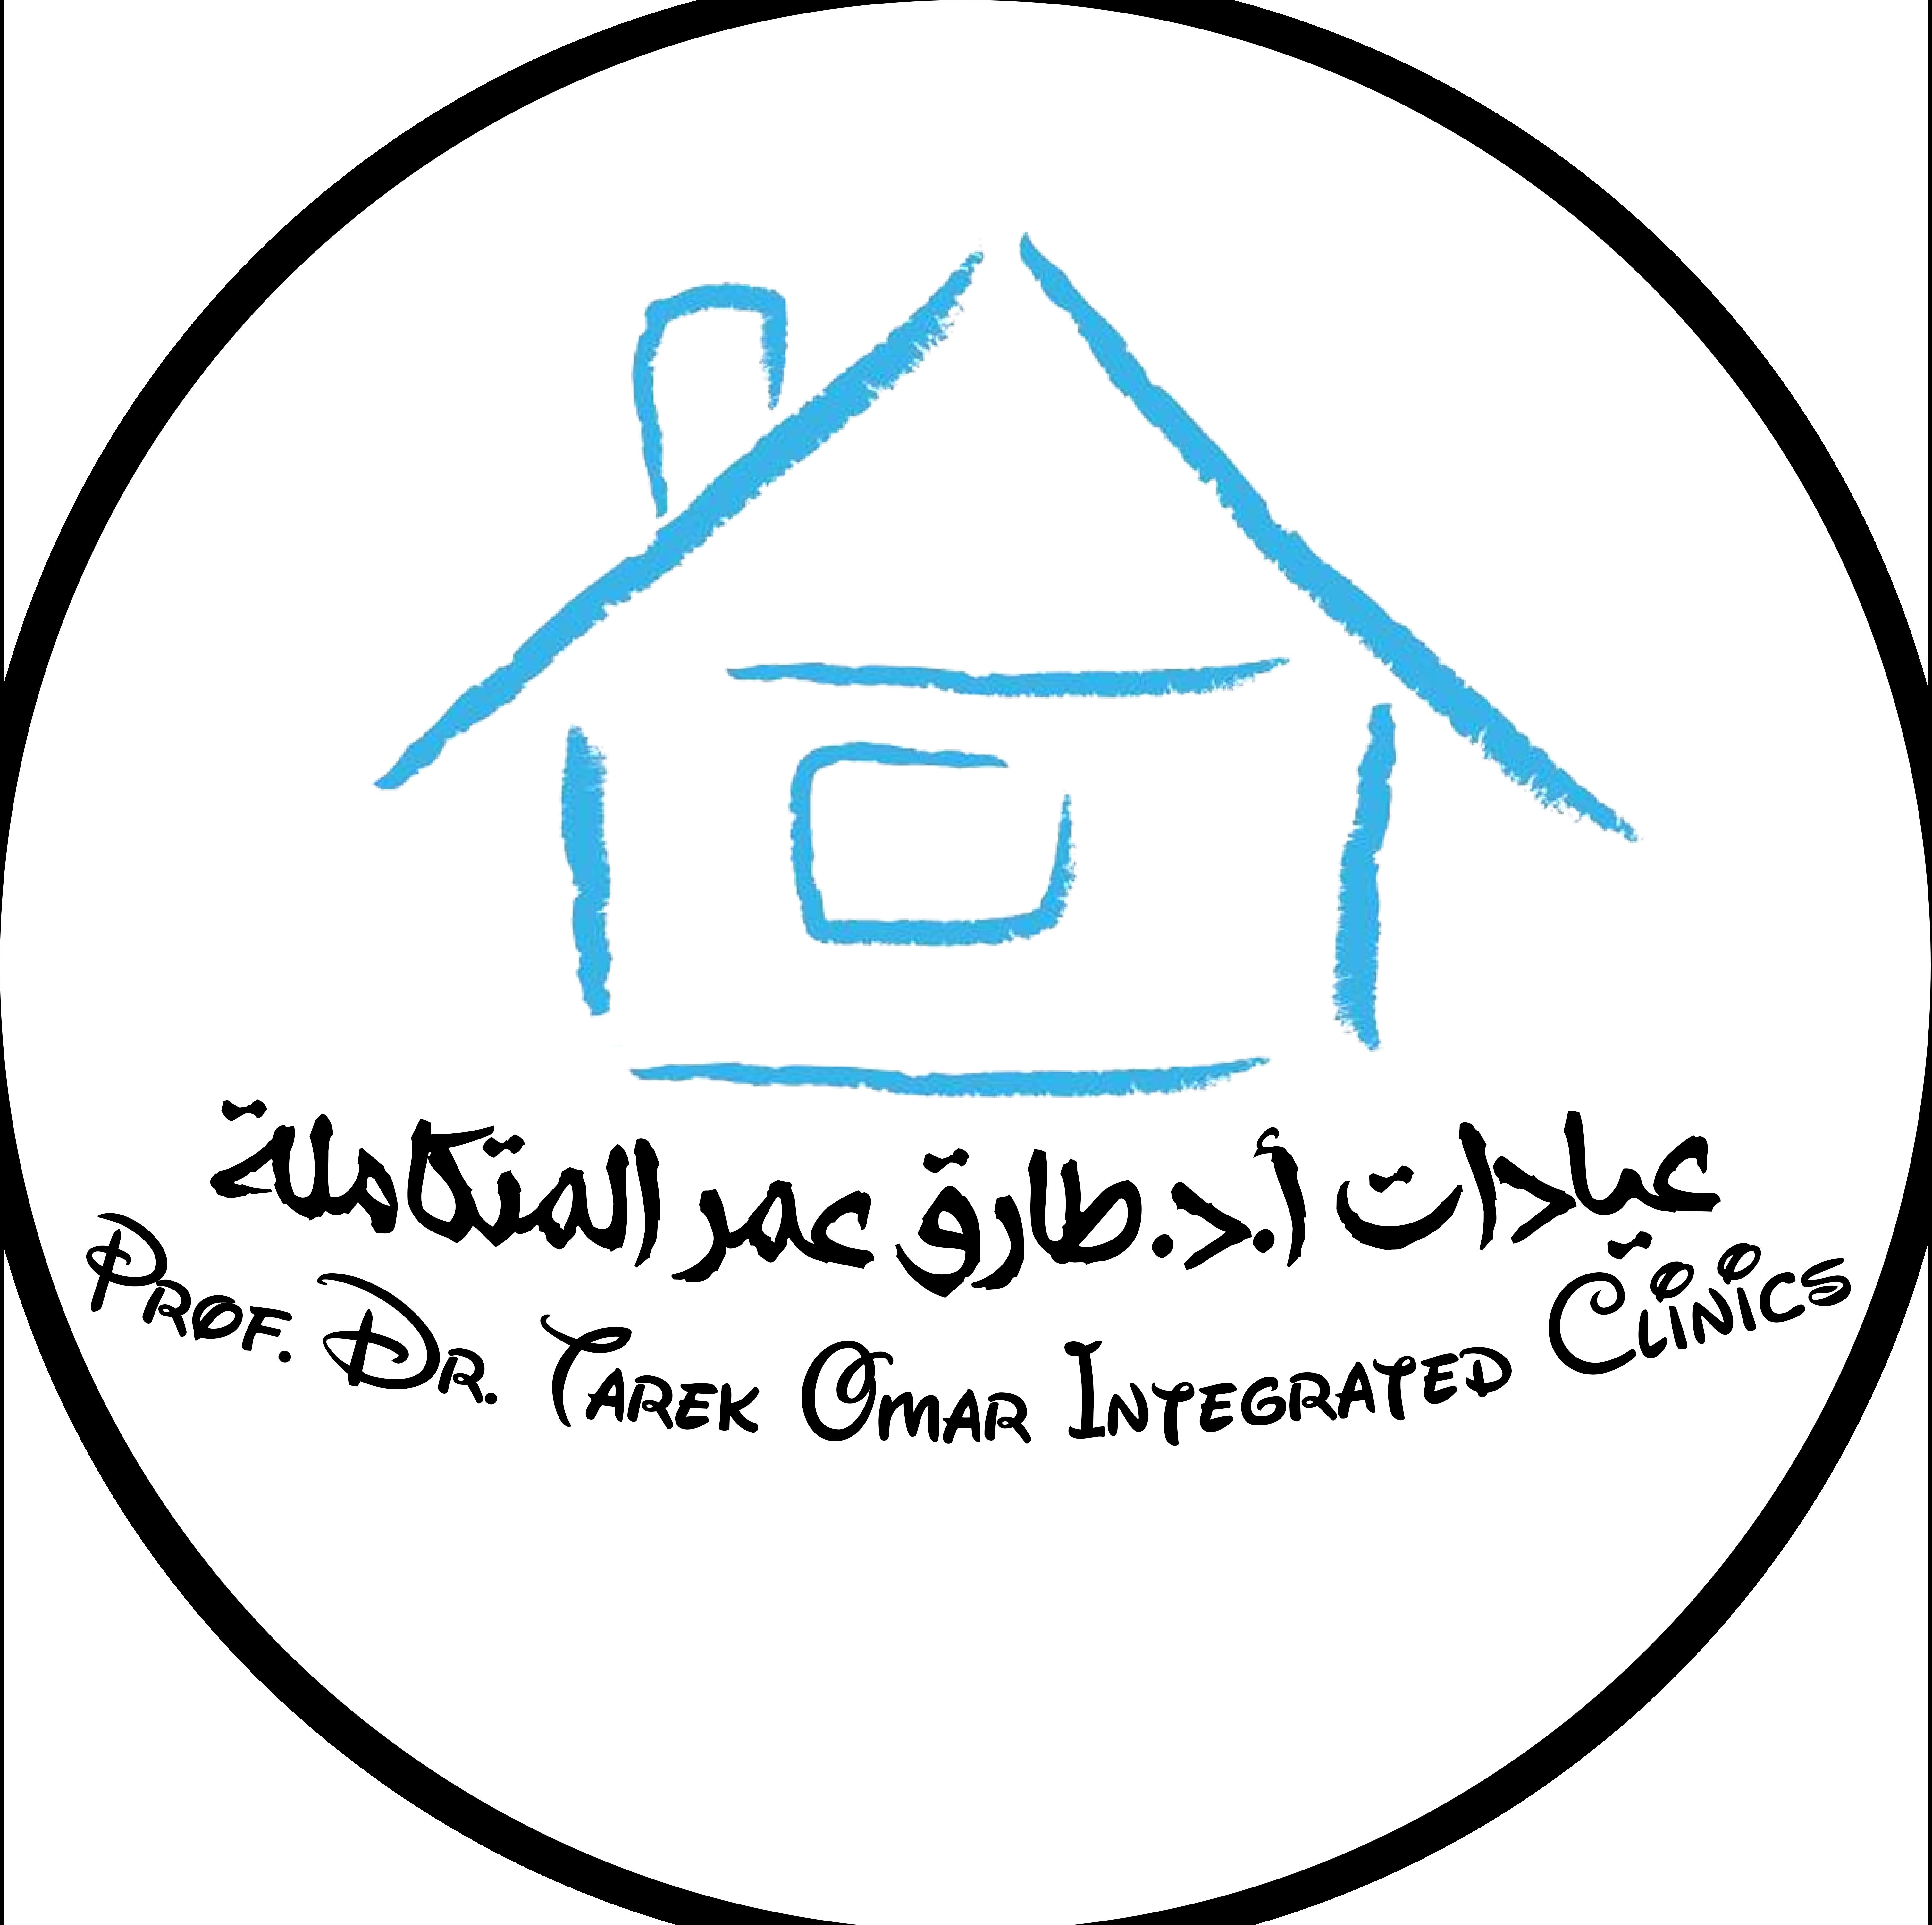 Dr. Tarek Omar Clinics